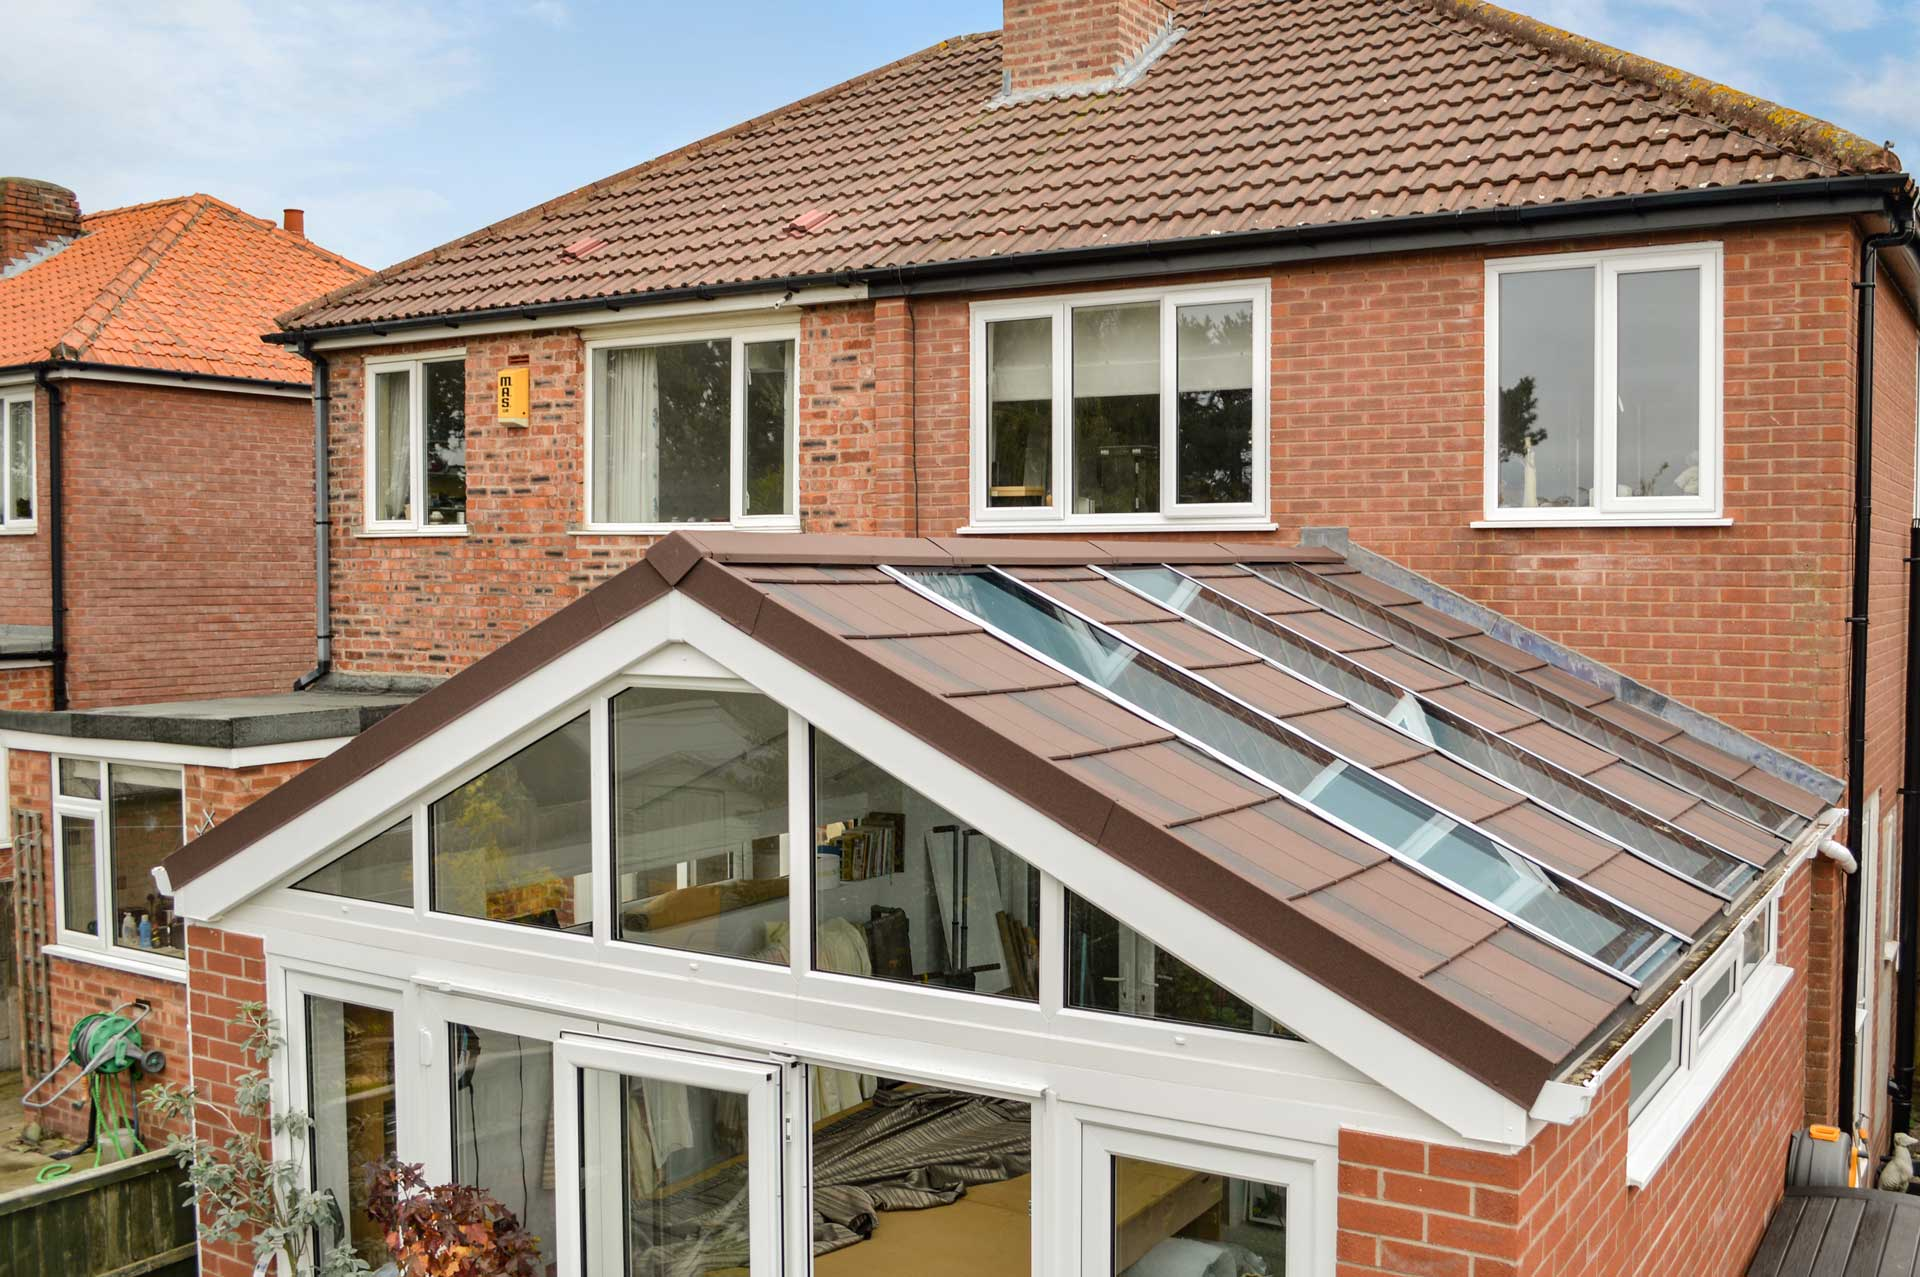 Roof Window Costs leighton buzzard